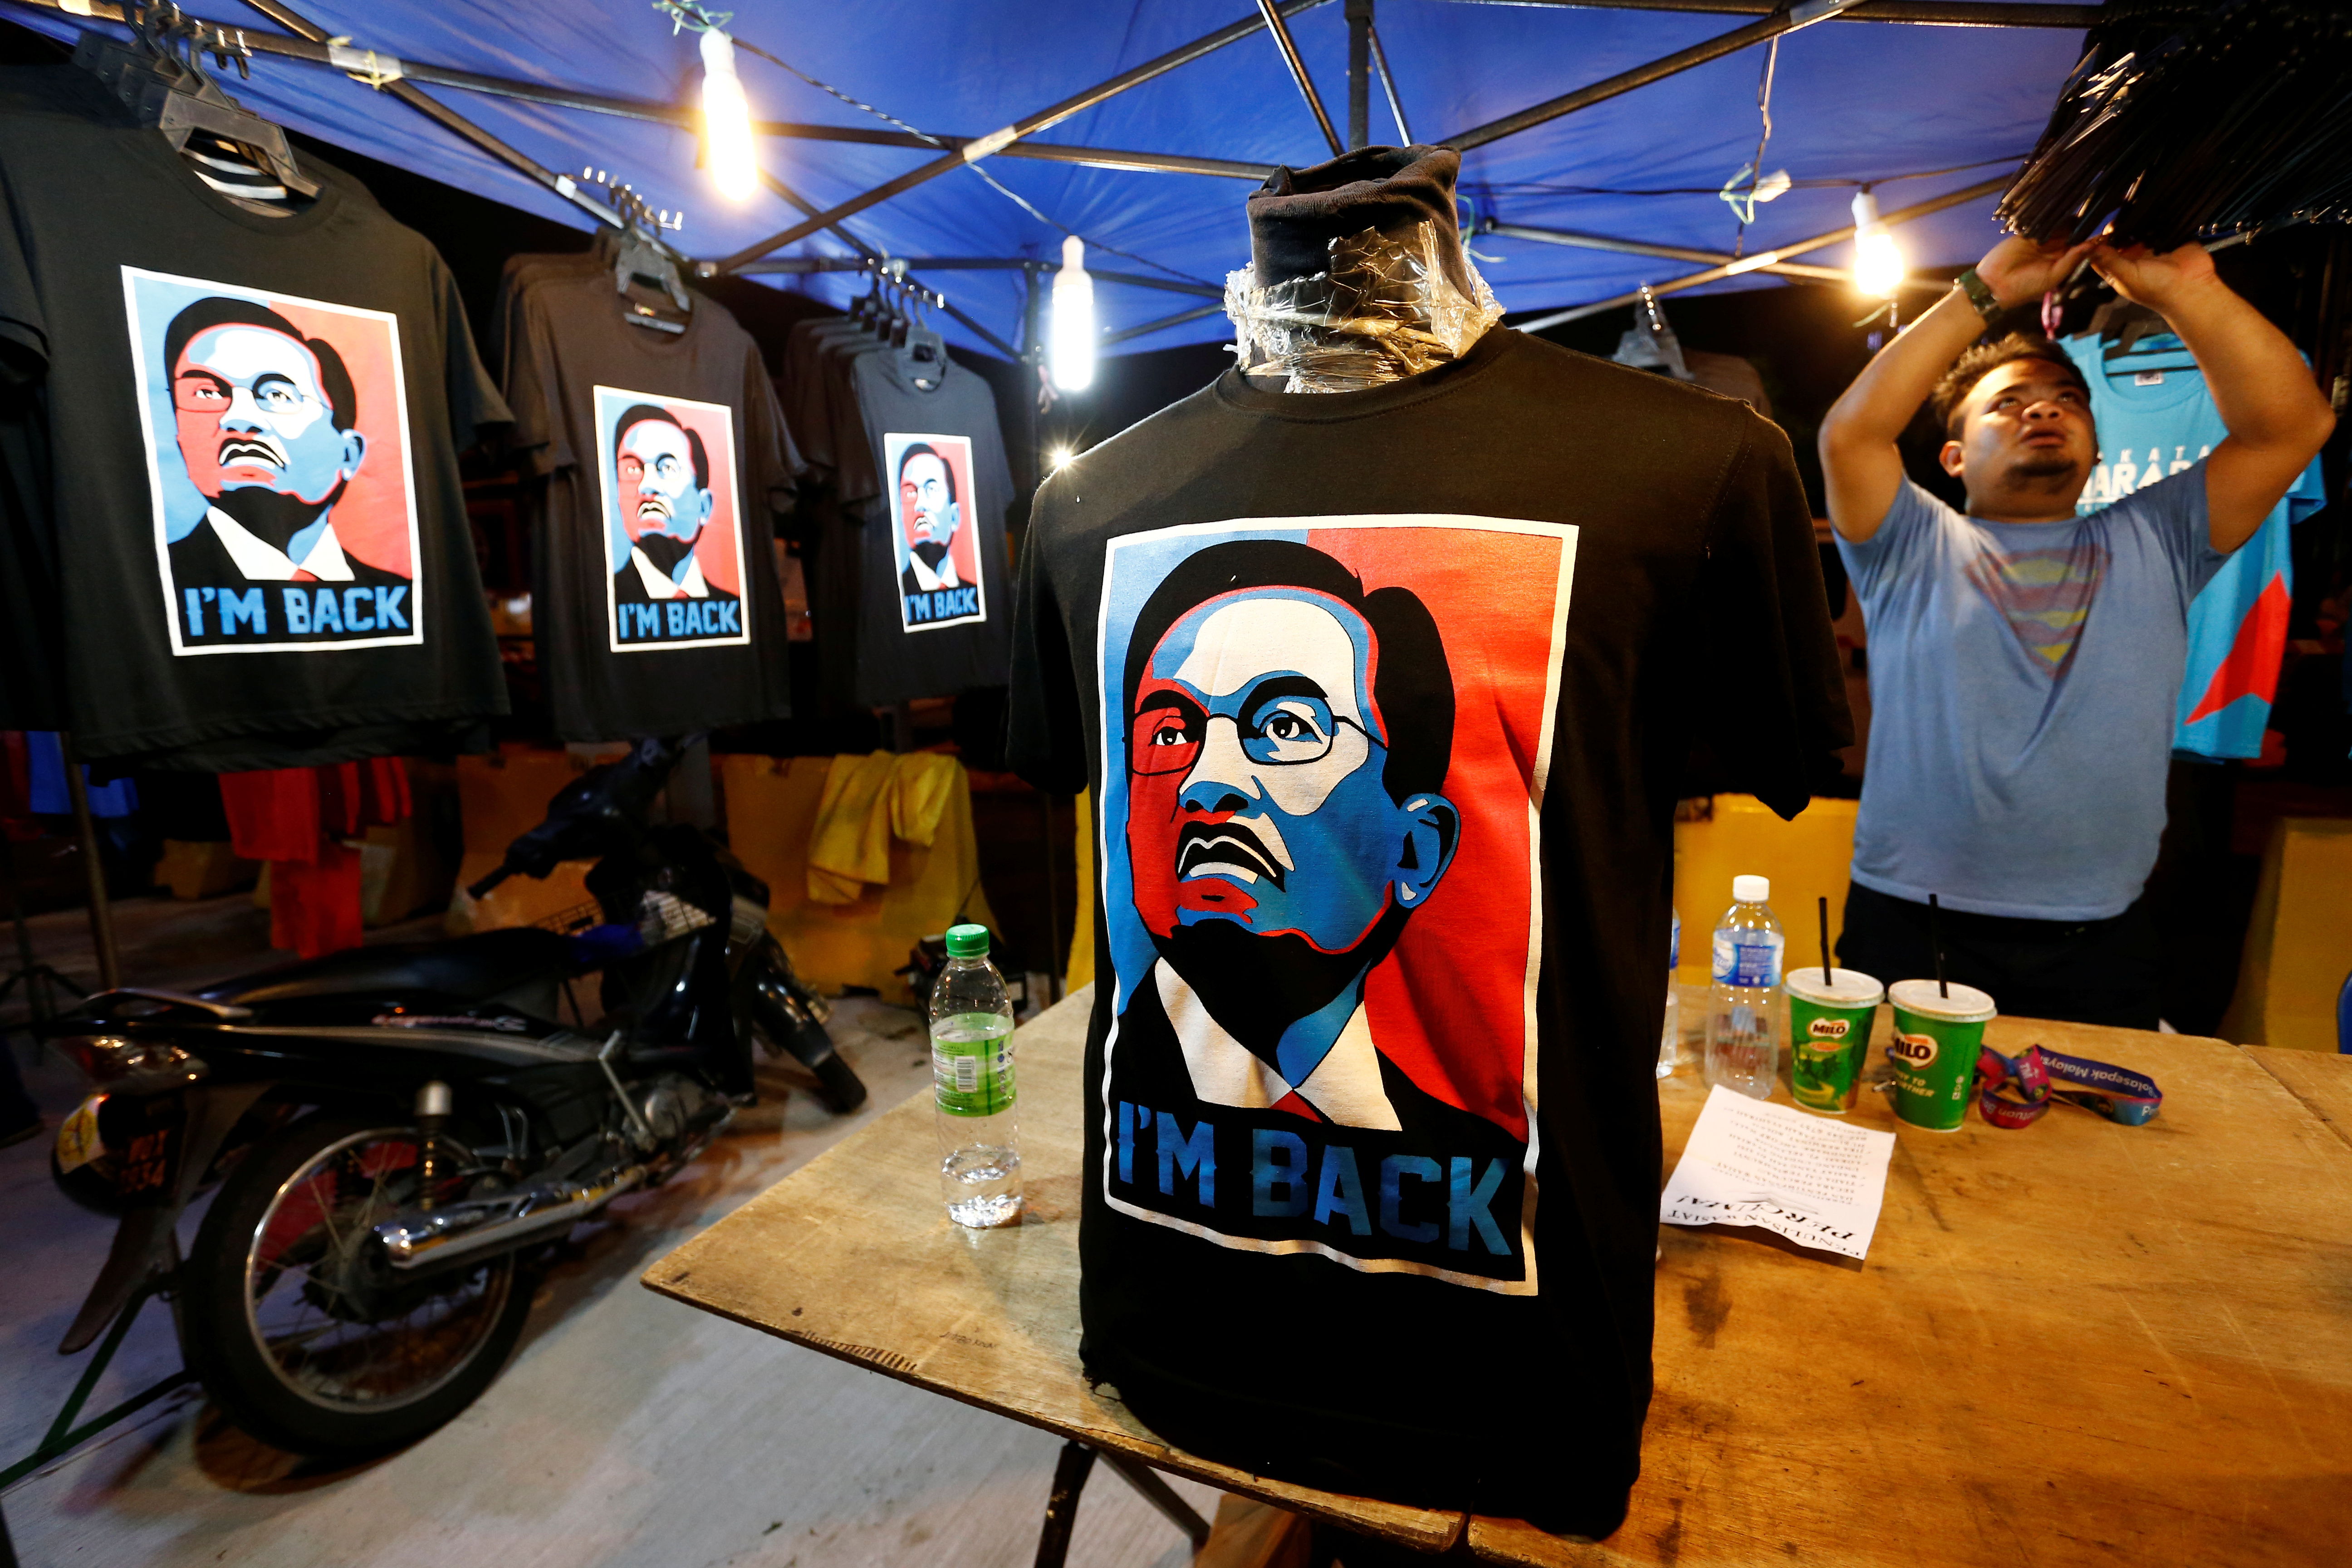 T-shirts depicting Anwar Ibrahim are displayed at a rally in Kuala Lumpur, Malaysia on May 16, 2018.